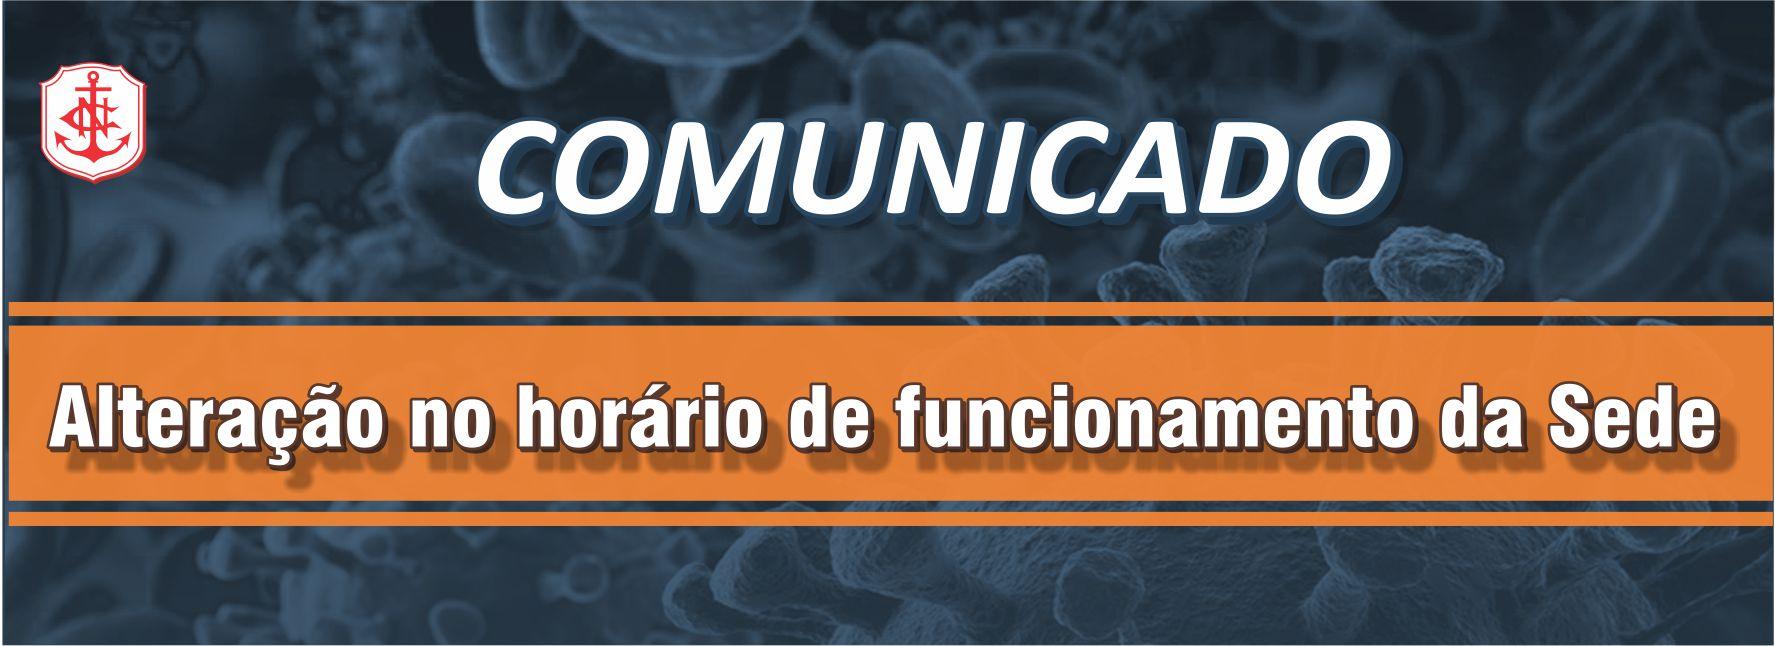 https://www.clubenaval.org.br/novo/?q=altera%C3%A7%C3%A3o-no-hor%C3%A1rio-de-funcionamento-da-sede-social-0